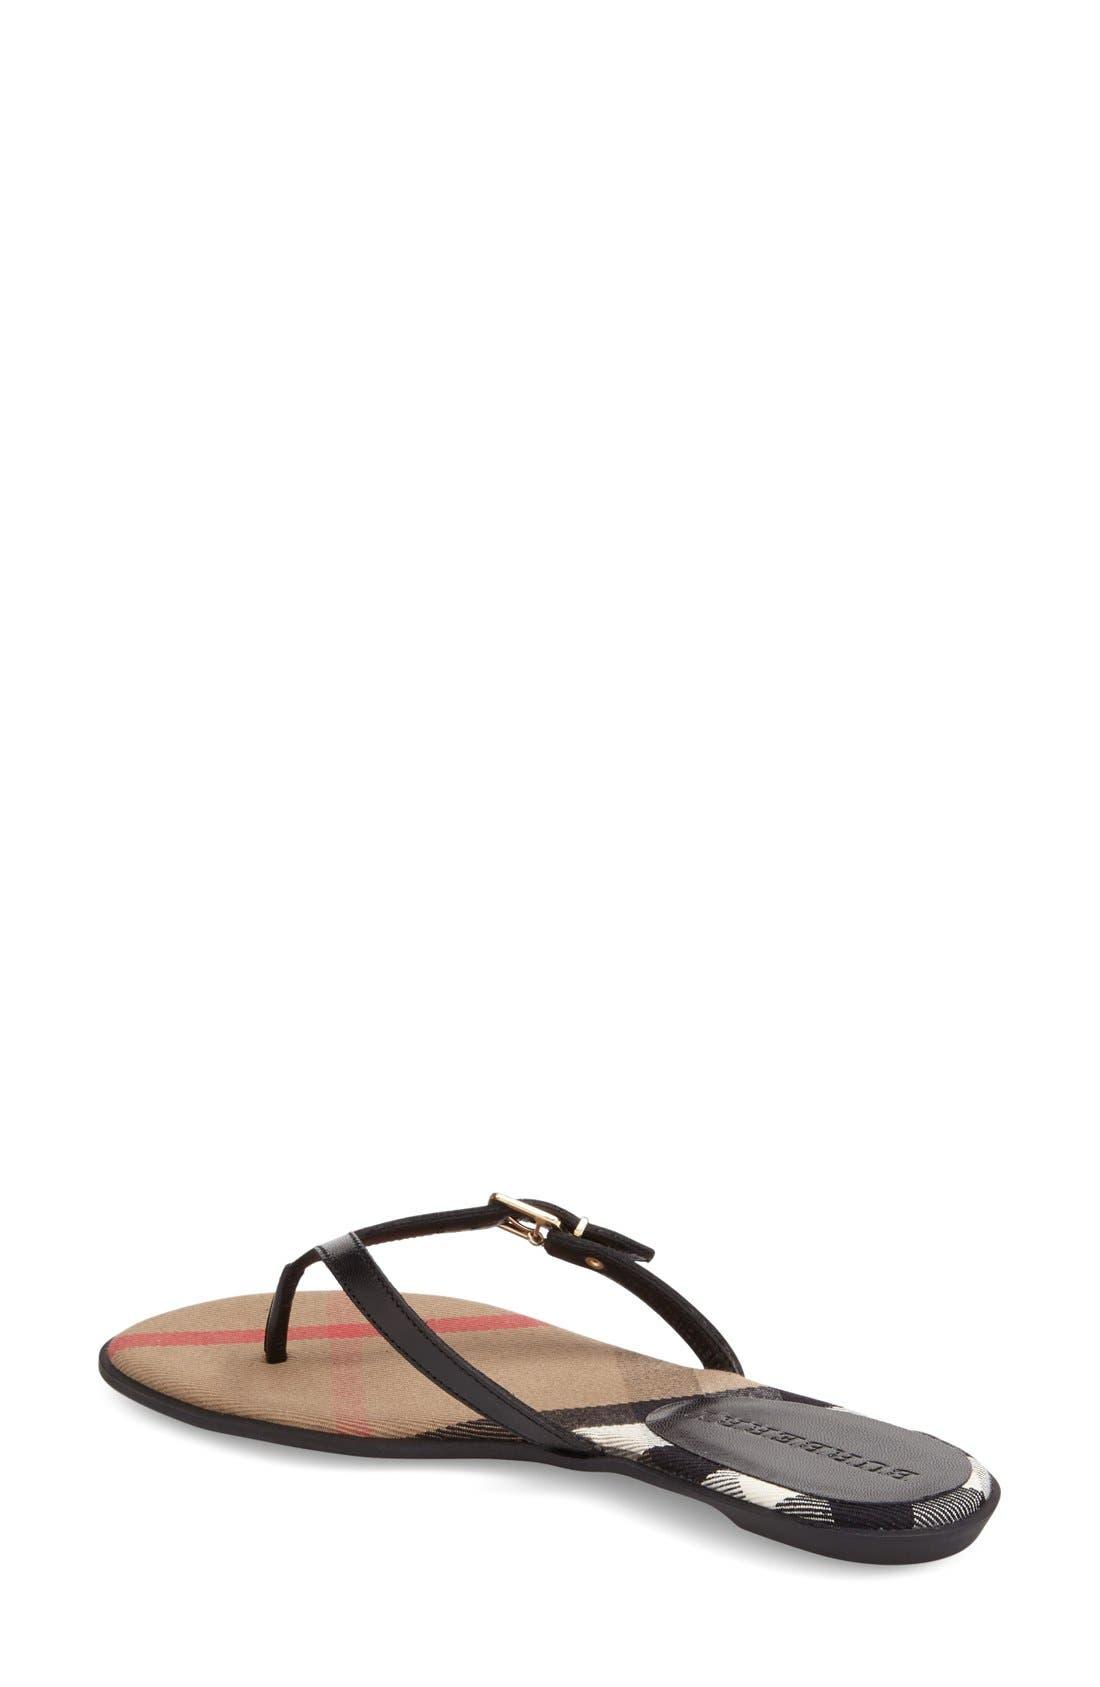 'Meadow' Sandal,                             Alternate thumbnail 3, color,                             001